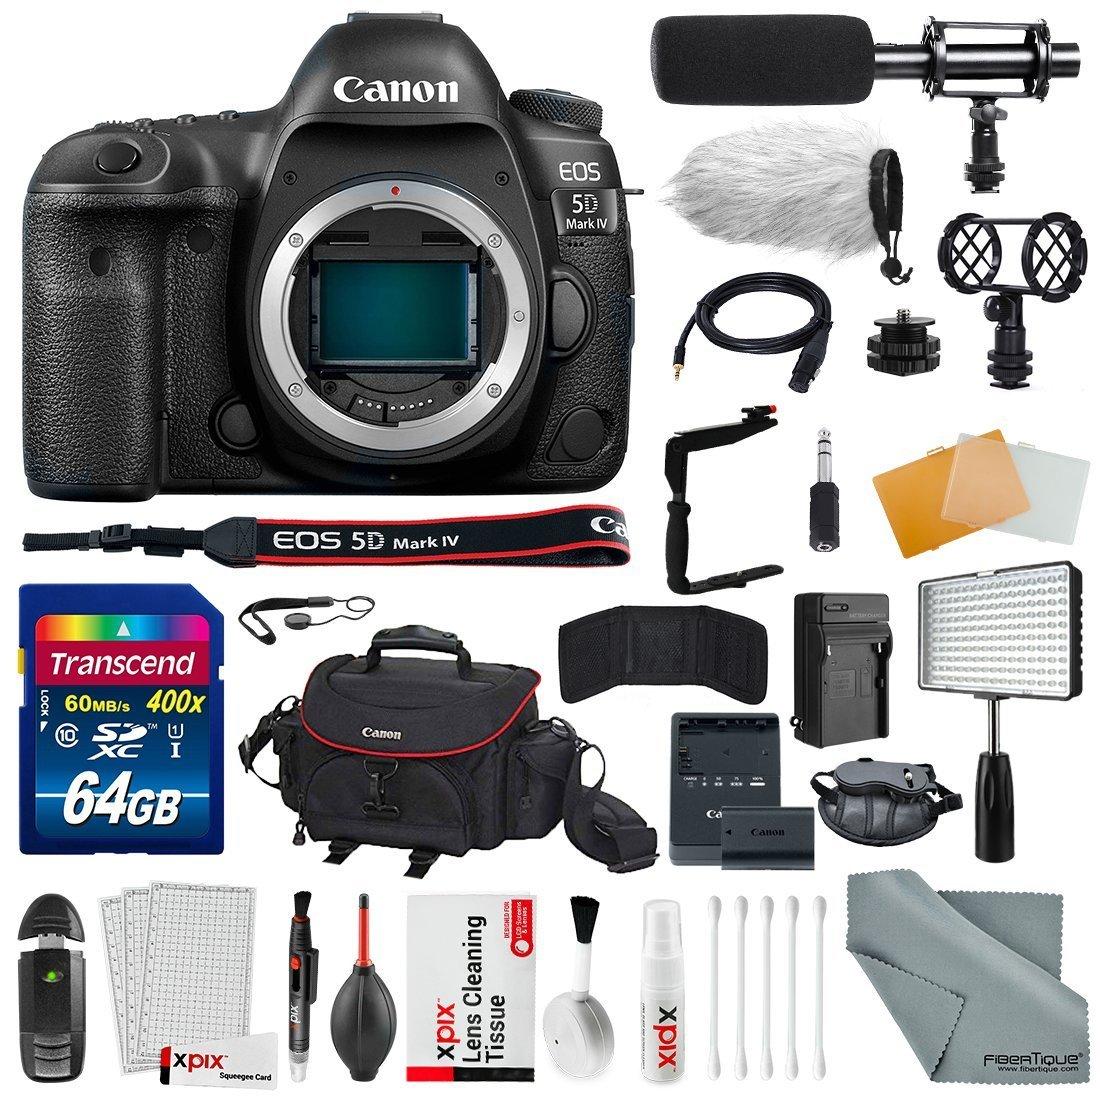 Canon EOS Rebel T2I Digital SLR Camera Vidpro External XM-L Lavalier Microphone